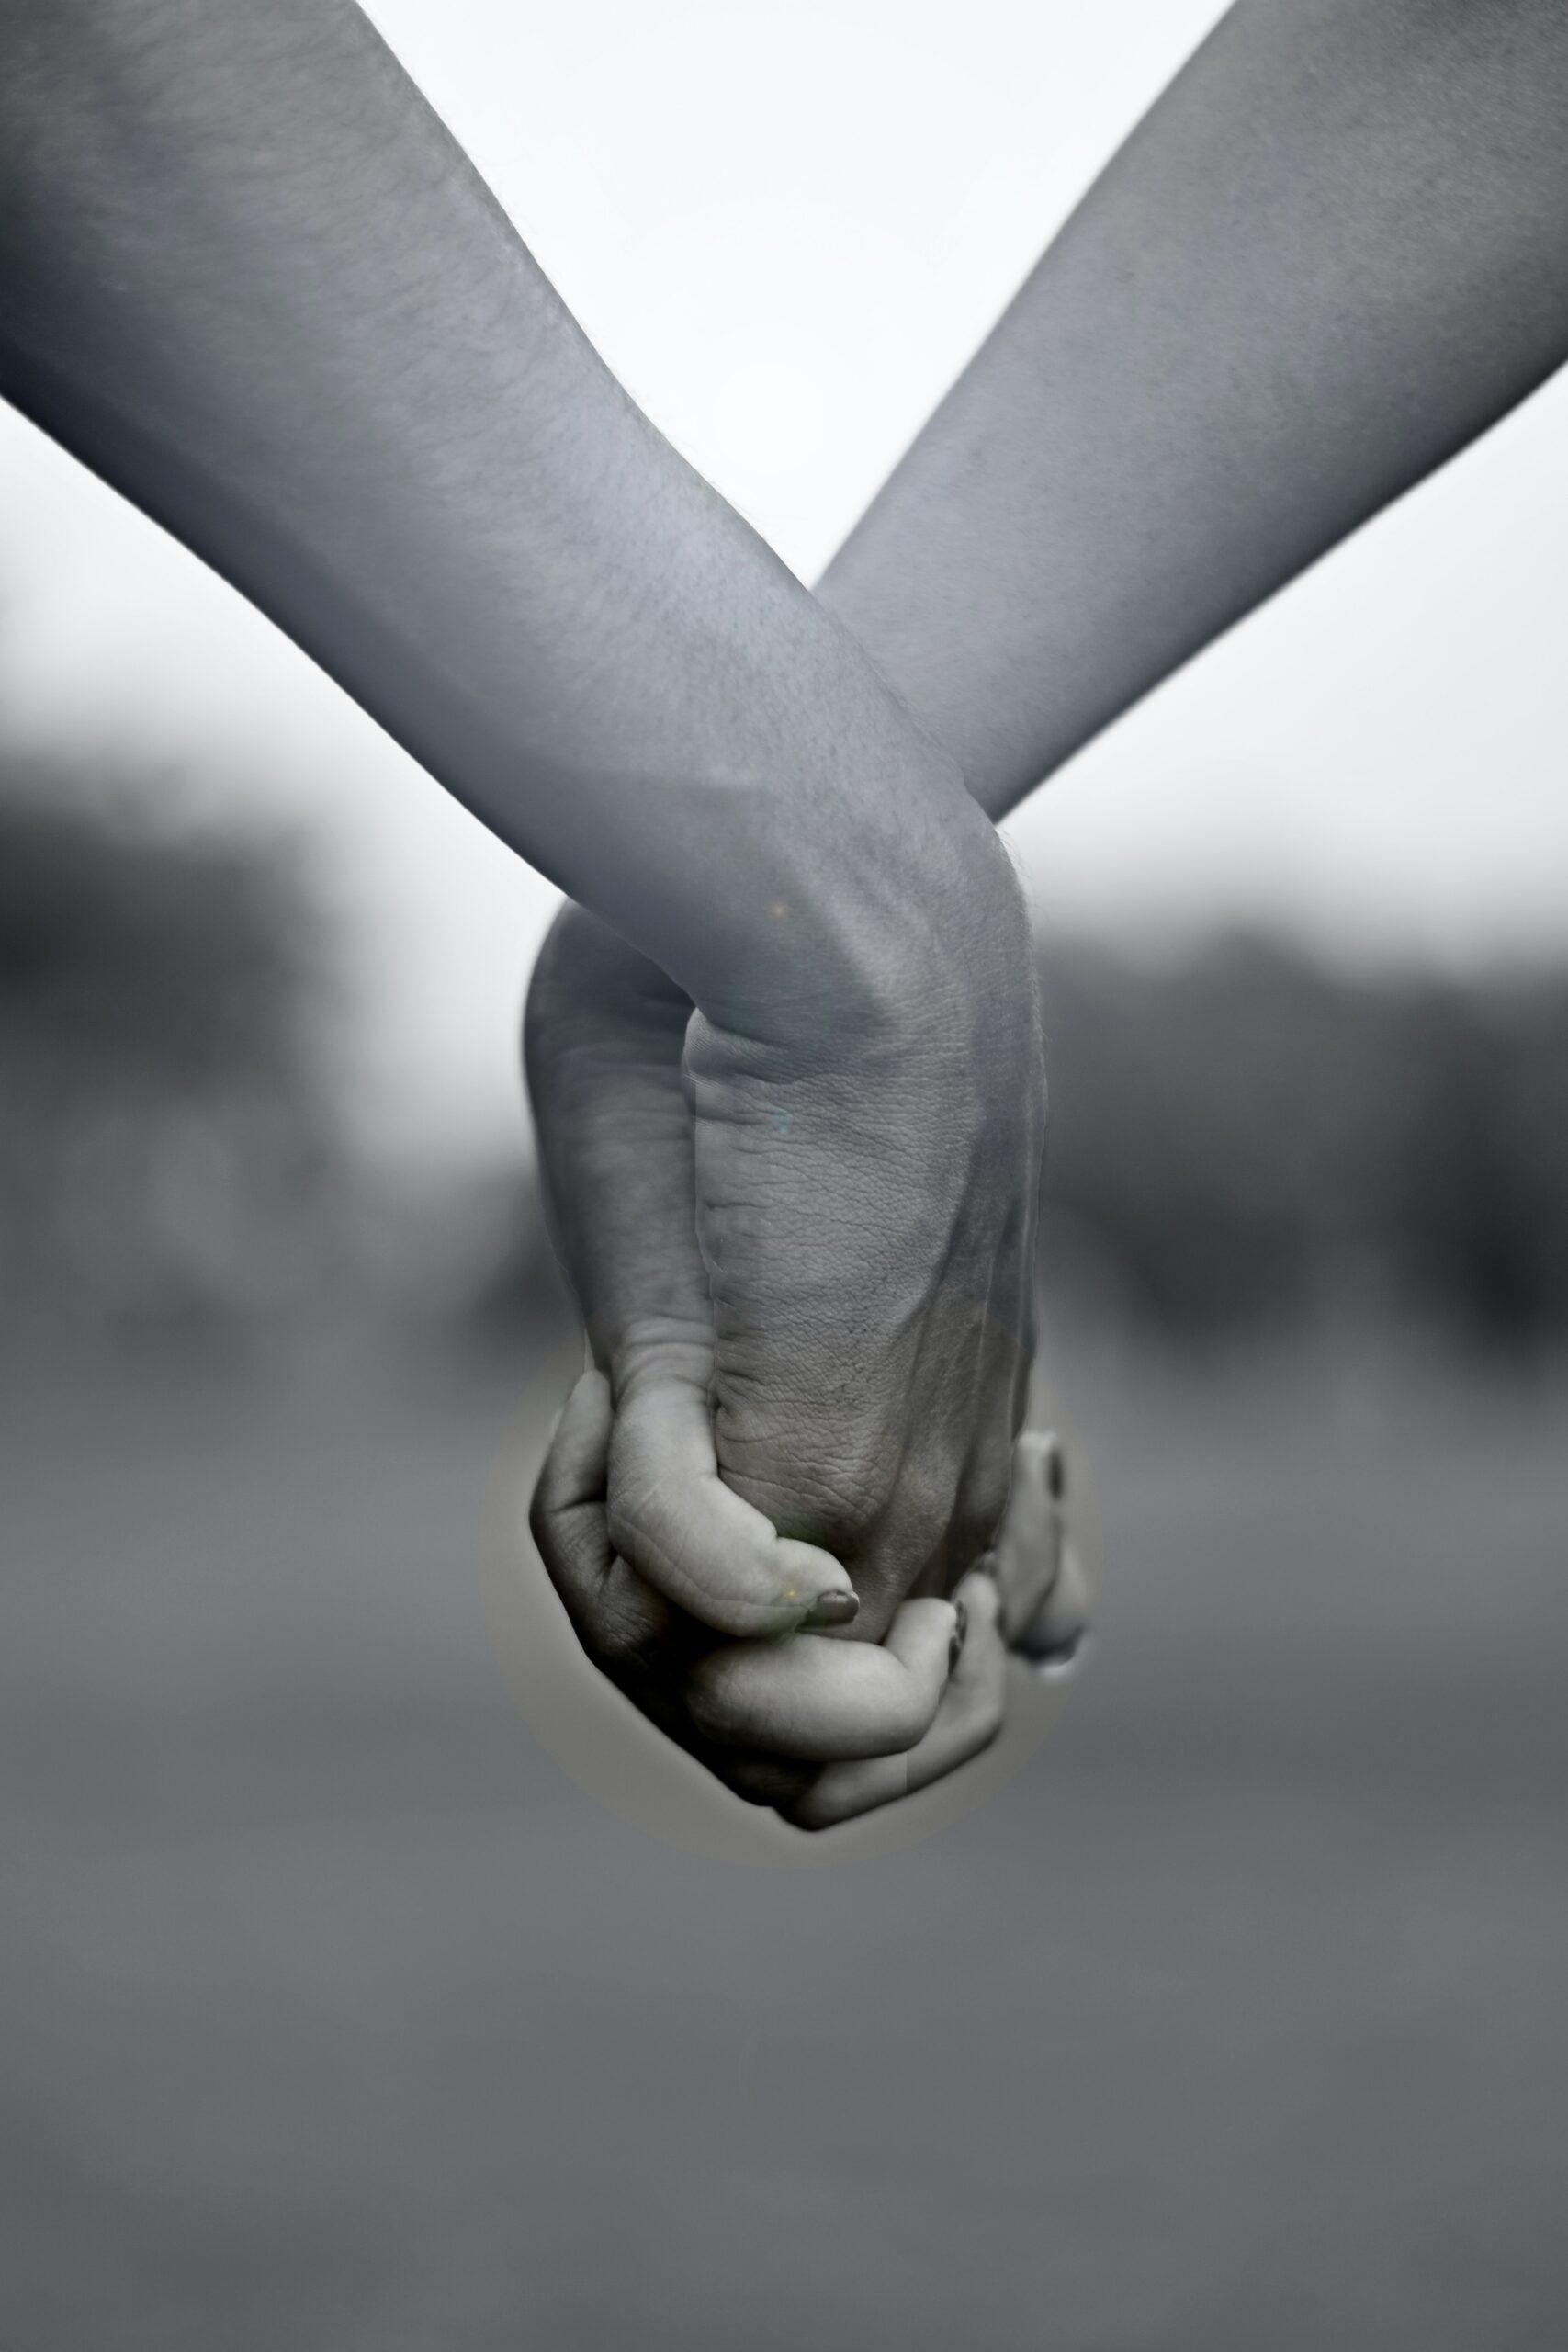 devotional, relationship, friendship, rejection, pain, loneliness, trust